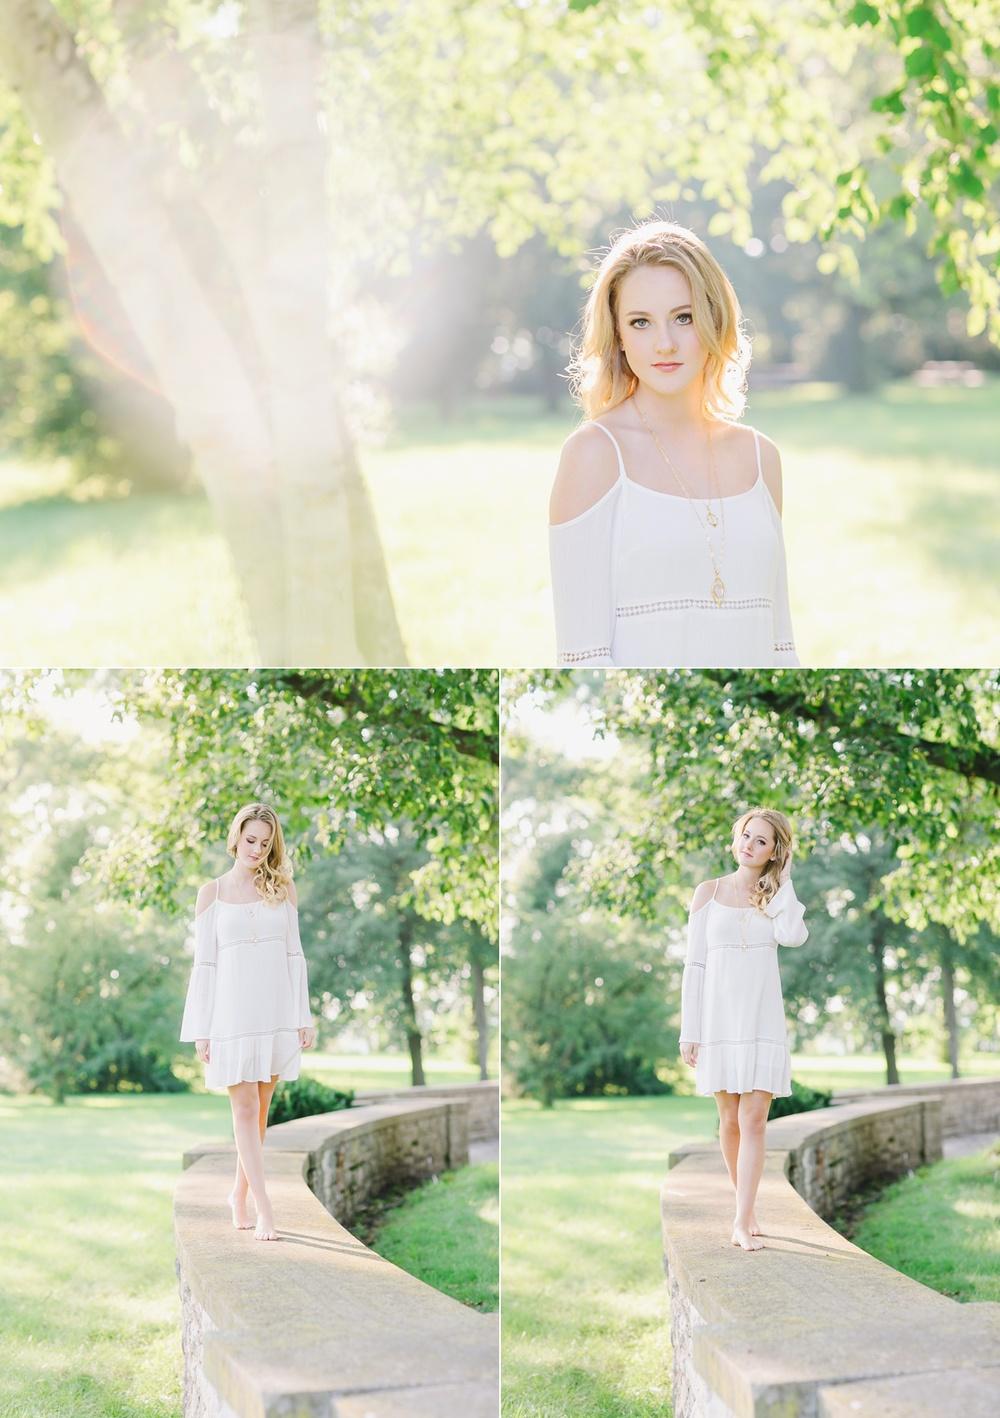 Lux-Senior-Photography-Dayton-Ohio-02.jpg